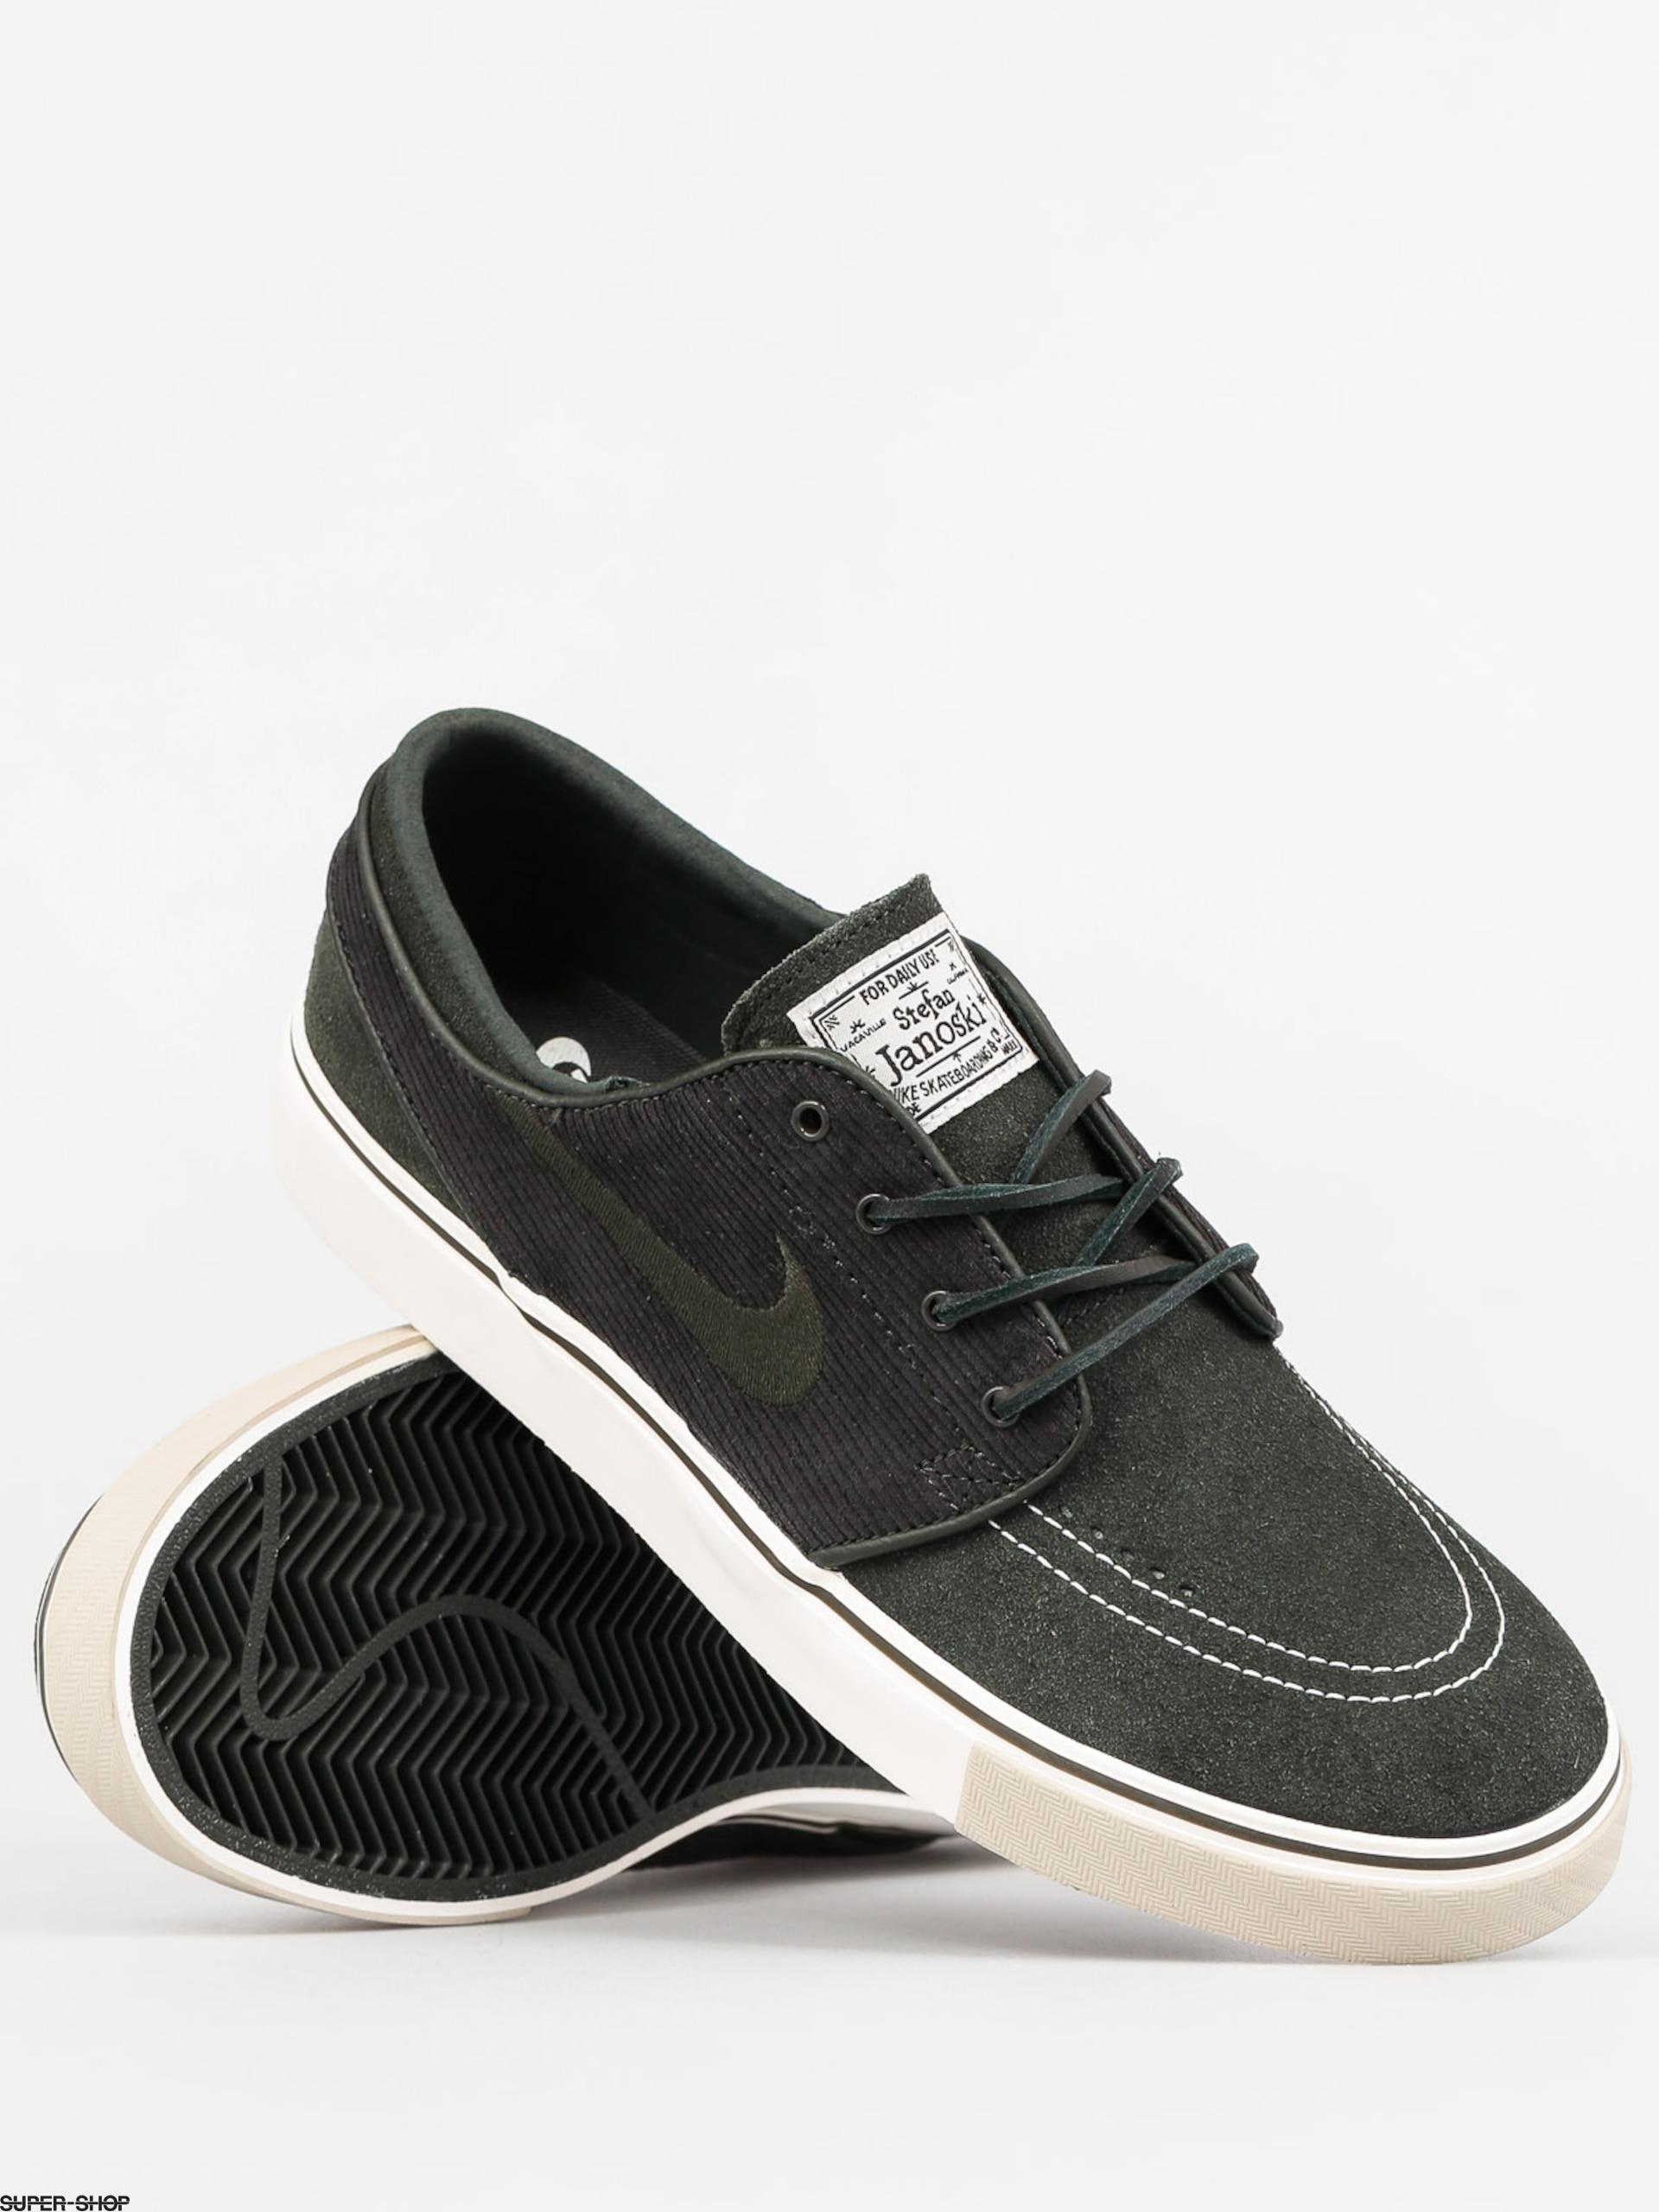 Nike SB Shoes Zoom Stefan Janoski Og (dark army/dark army sail)